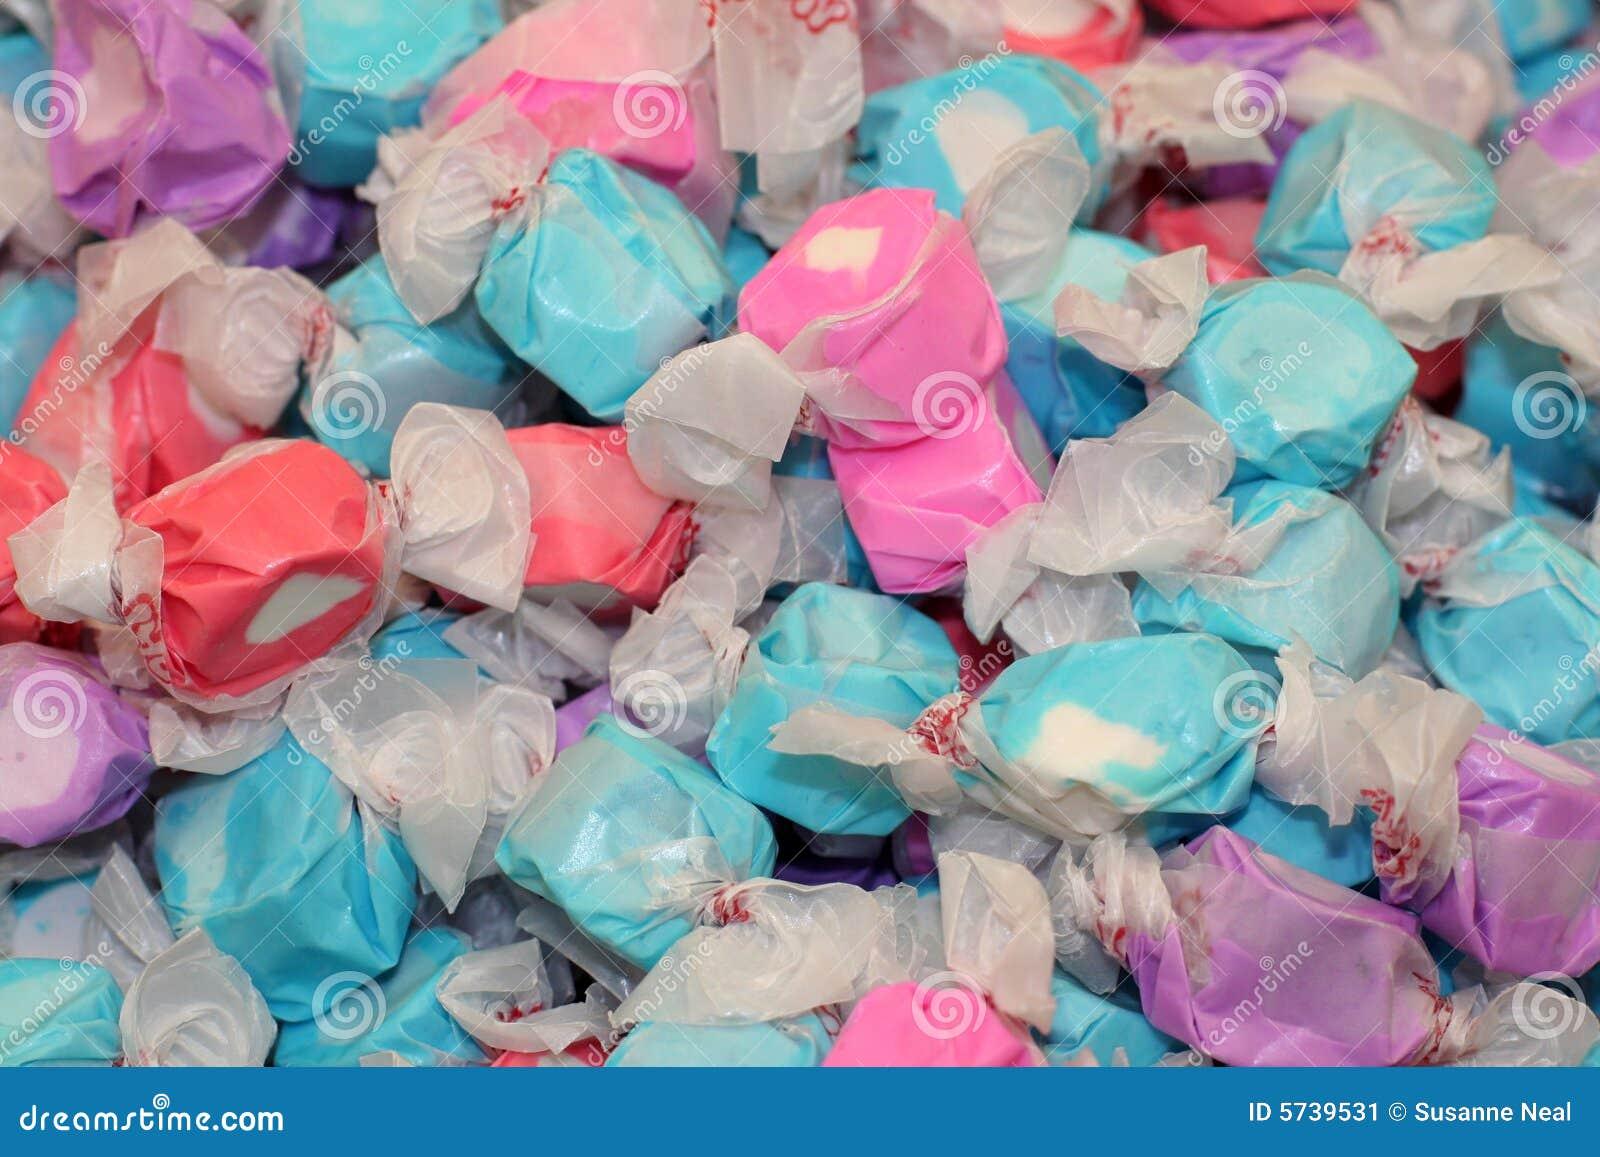 Colorful blue, pink, purple salt water taffy